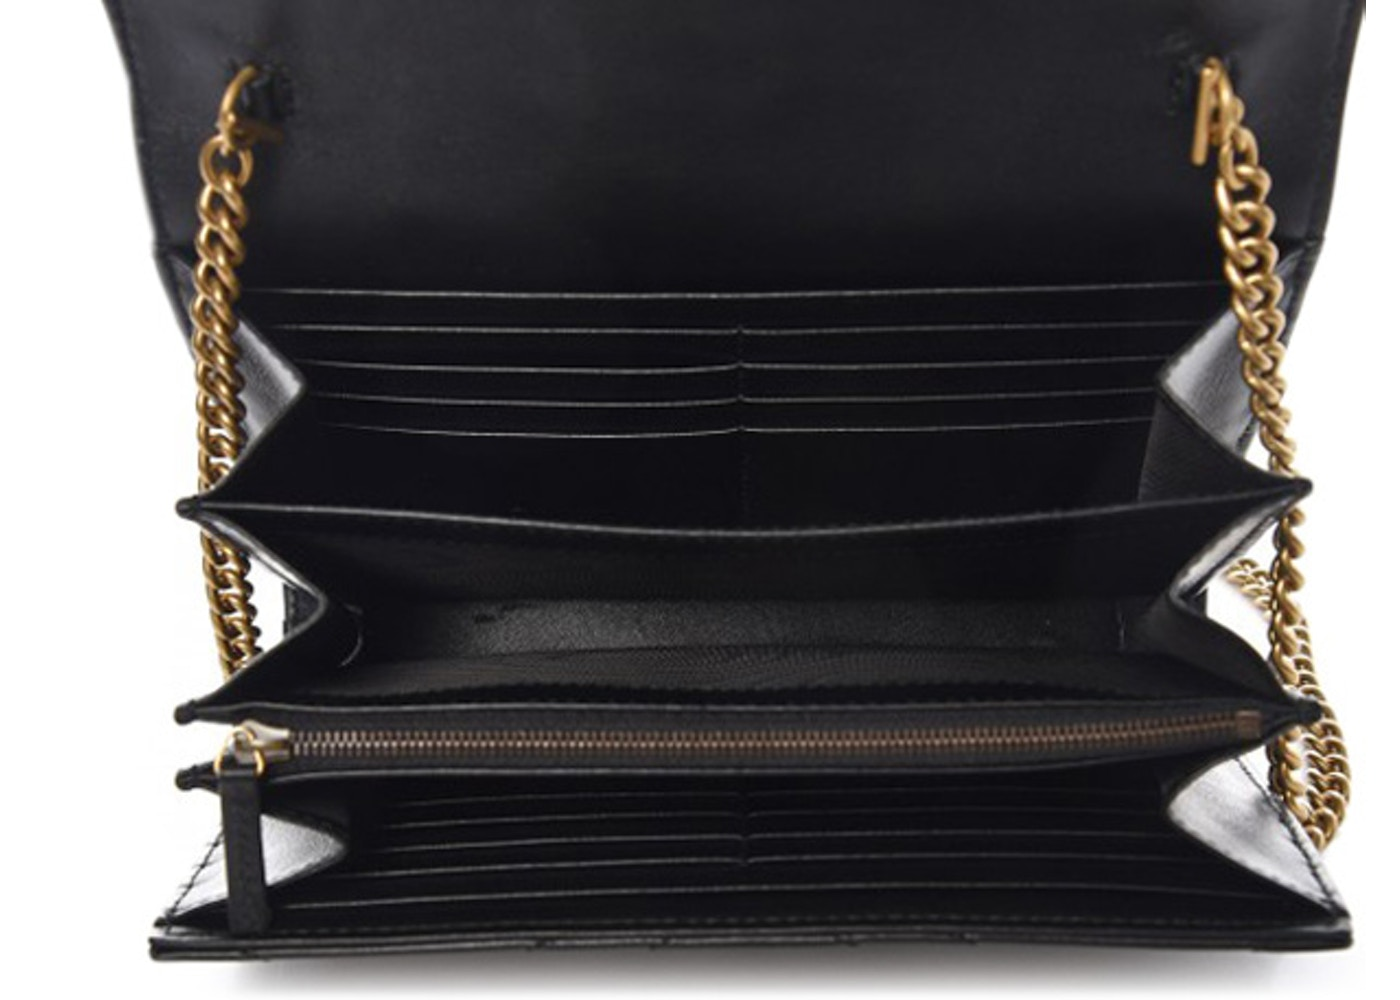 2b5f5661288 Gucci Marmont Wallet on Chain Matelasse Black